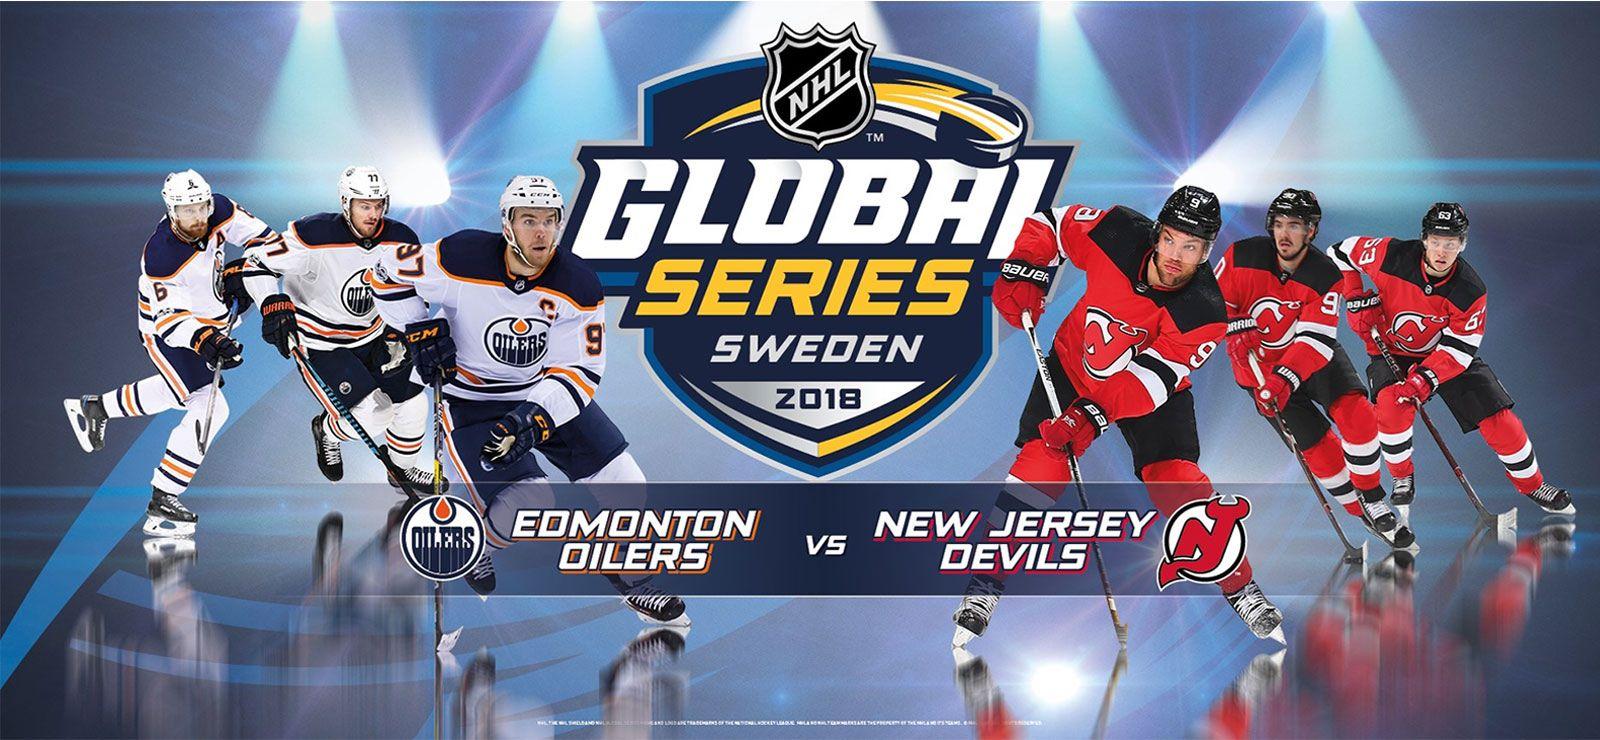 Global Series 2018